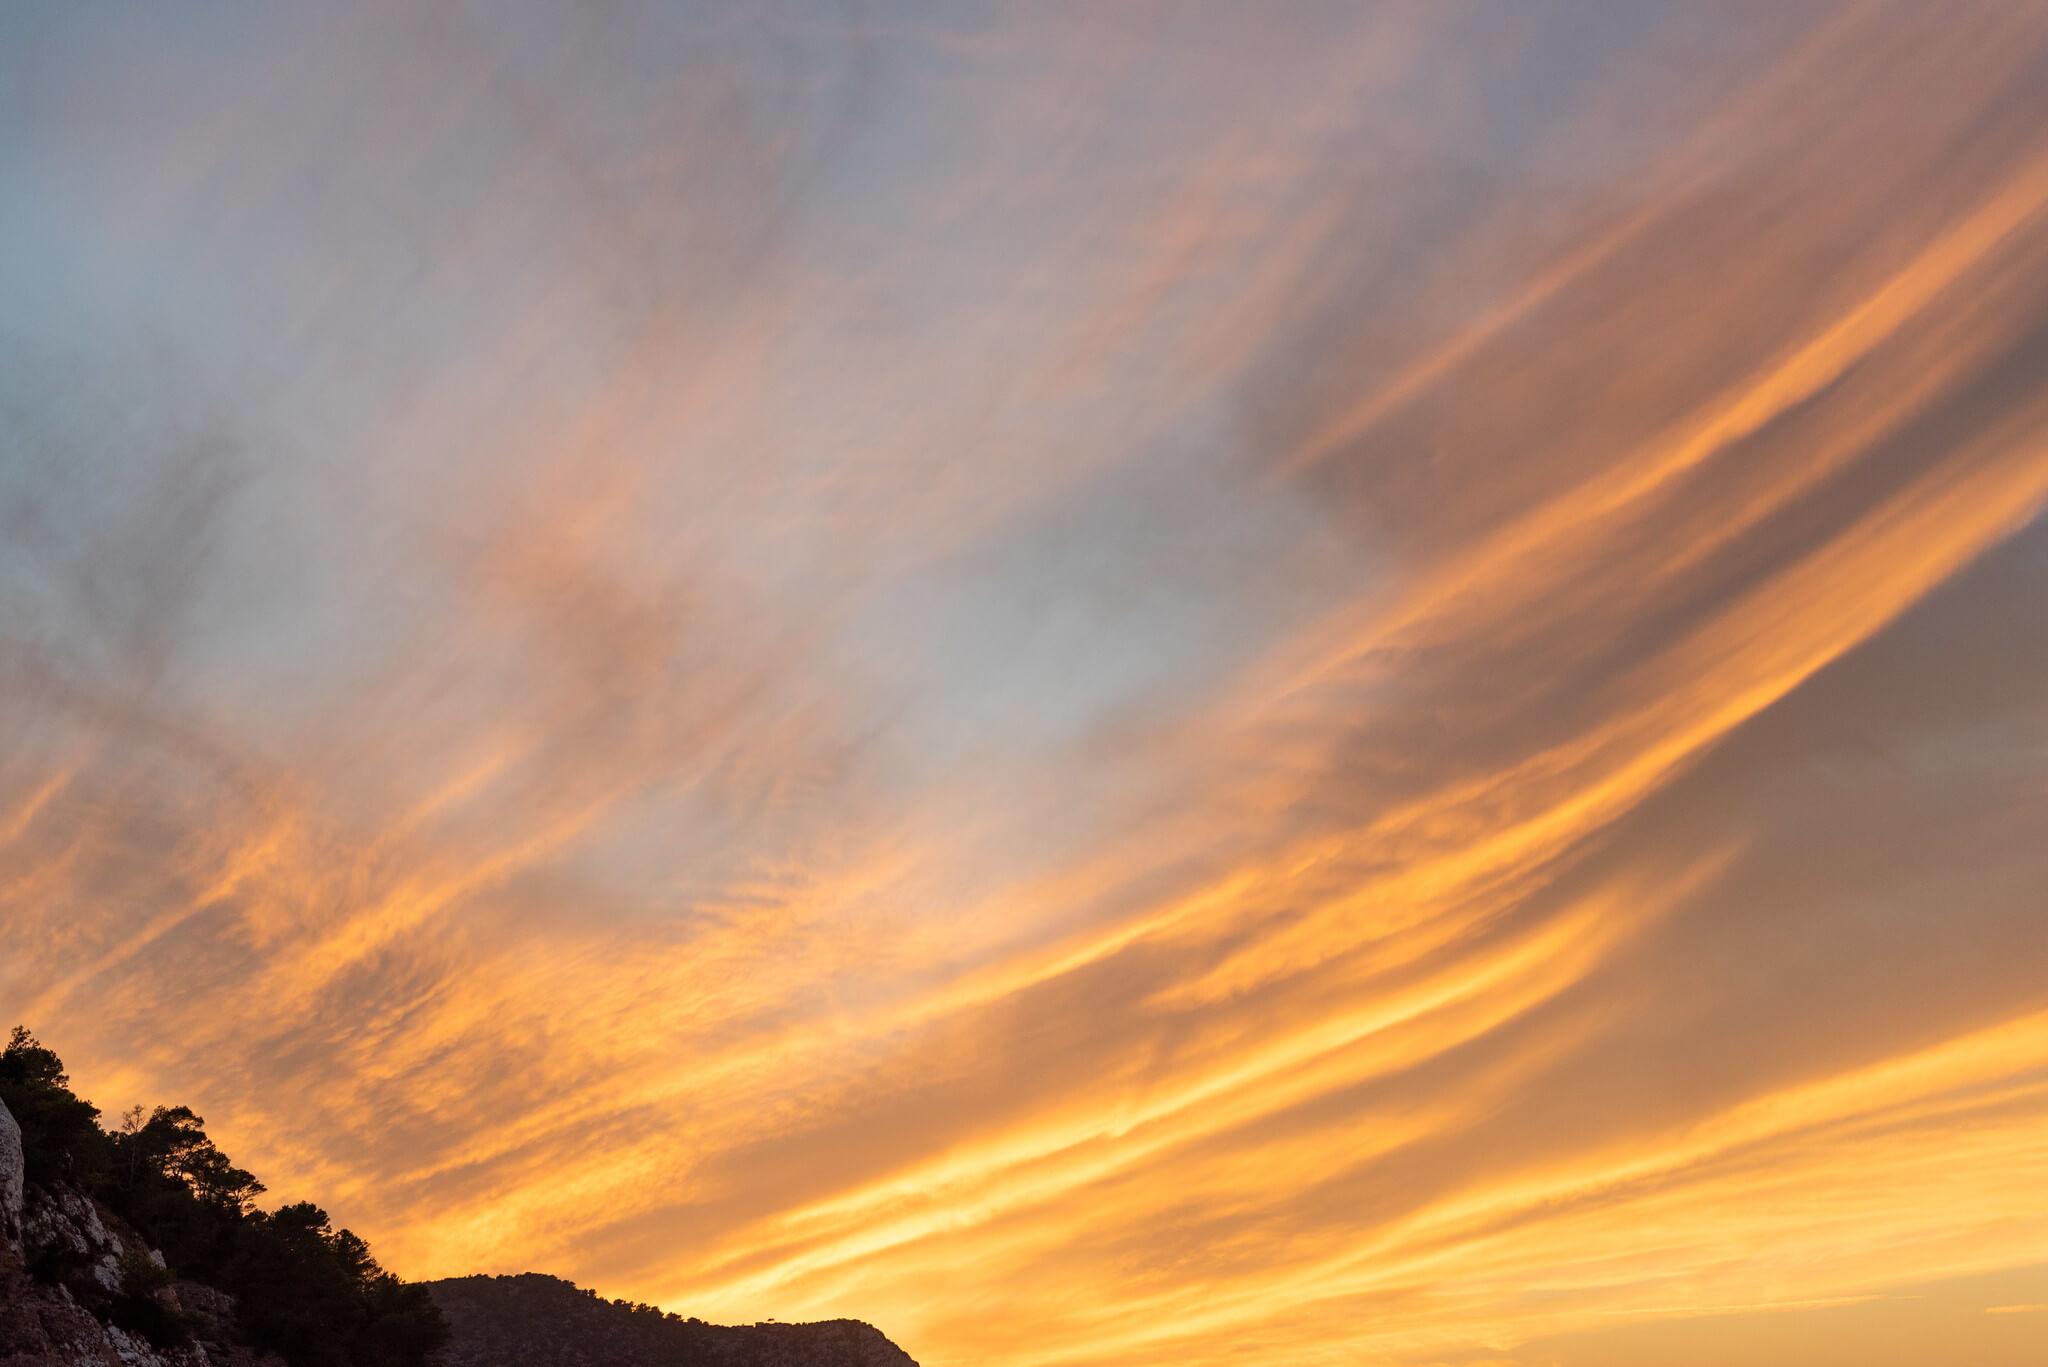 https://www.white-ibiza.com/wp-content/uploads/2020/03/ibiza-sunsets-benirras-2020-09.jpg